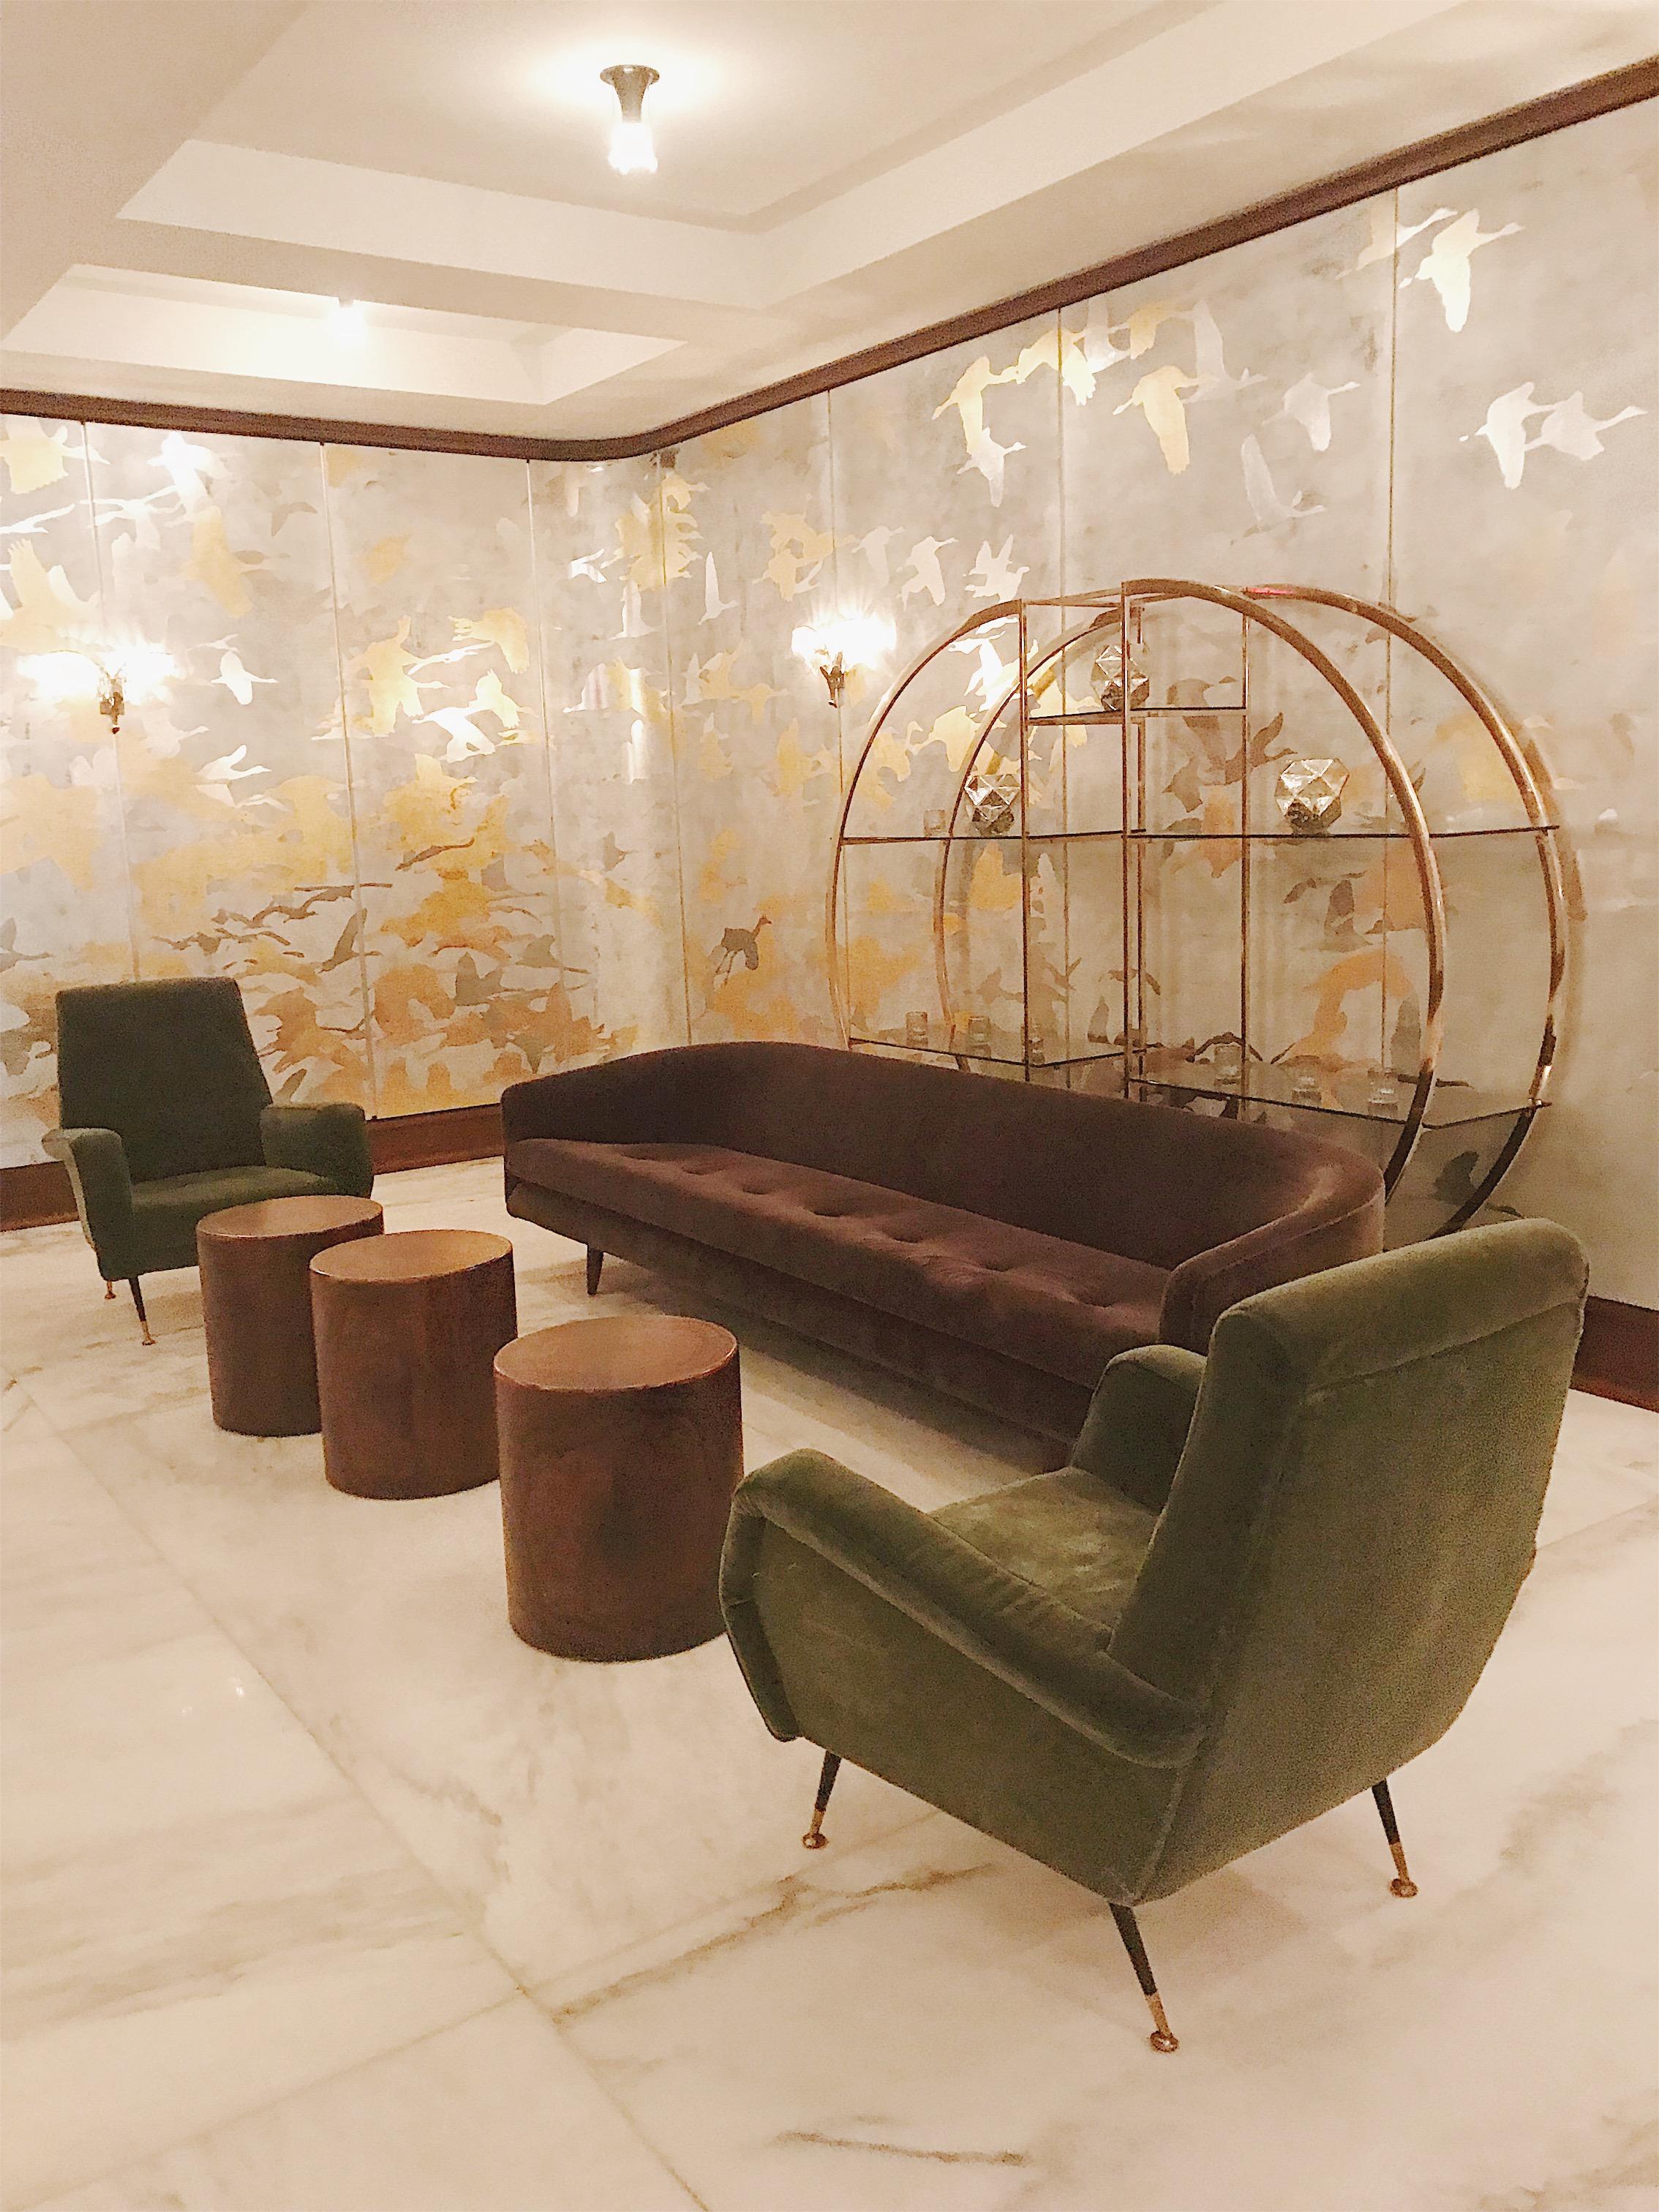 The Dewberry hotel lobby